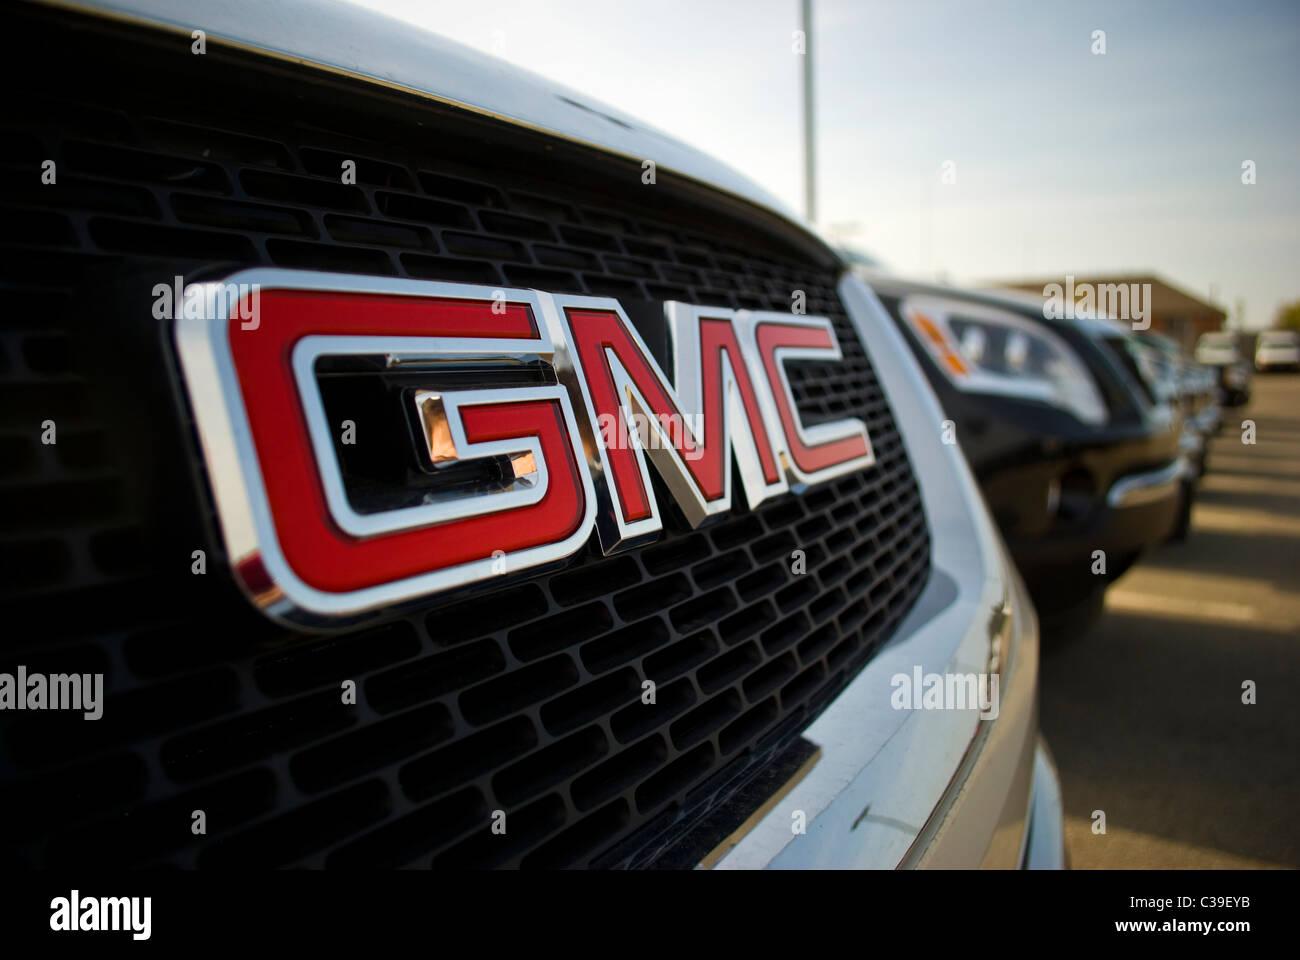 The GMC emblem. - Stock Image